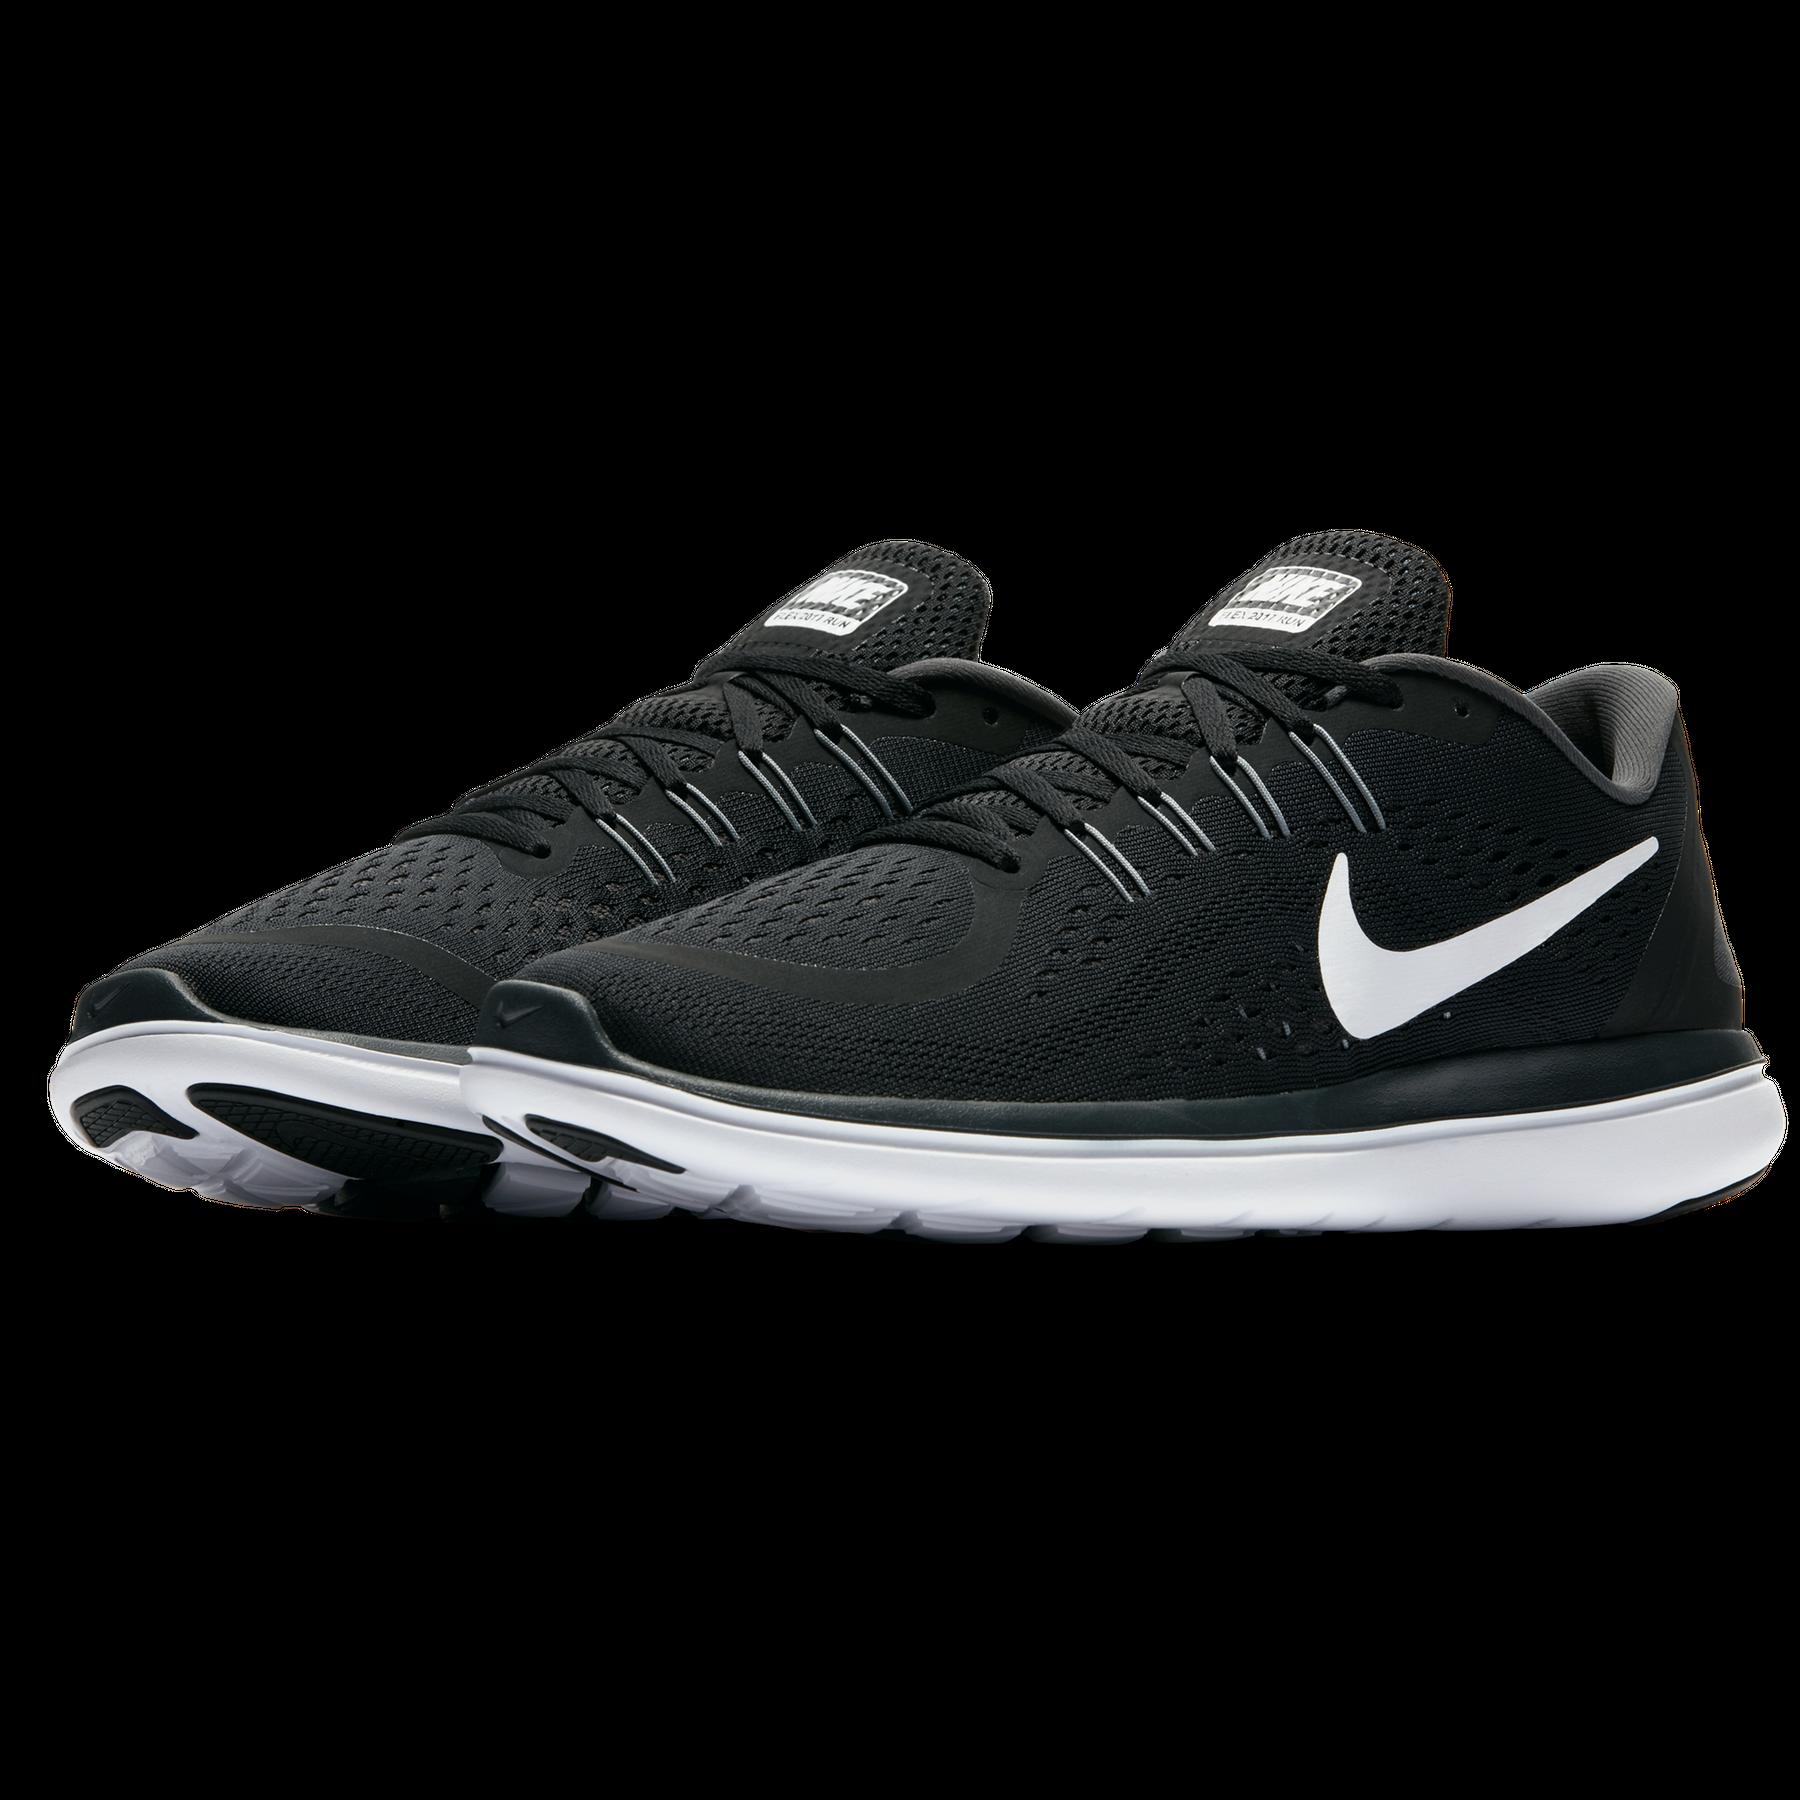 cheaper e89d4 537c6 Nike Flex 2017 RN schwarz weiß Herren